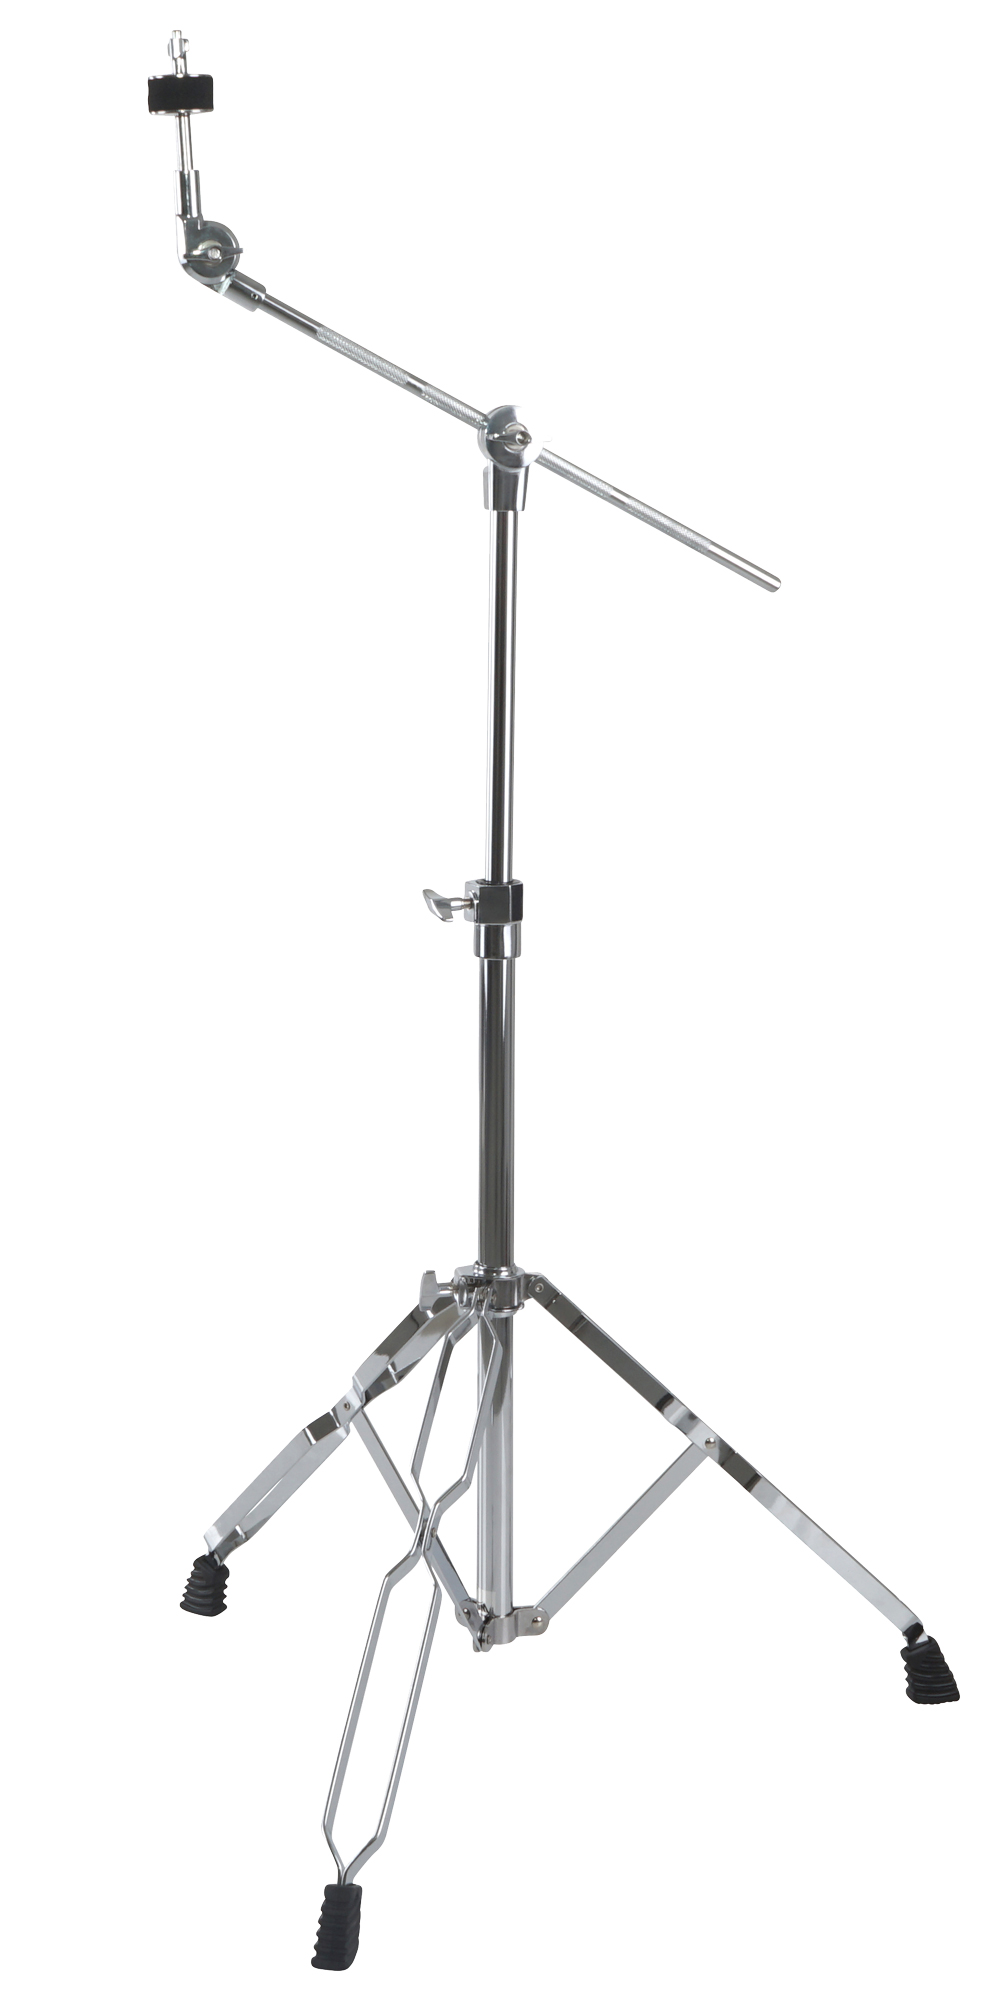 xdrum semi 20 standard drumset red set incl boom stand crash cymbals. Black Bedroom Furniture Sets. Home Design Ideas